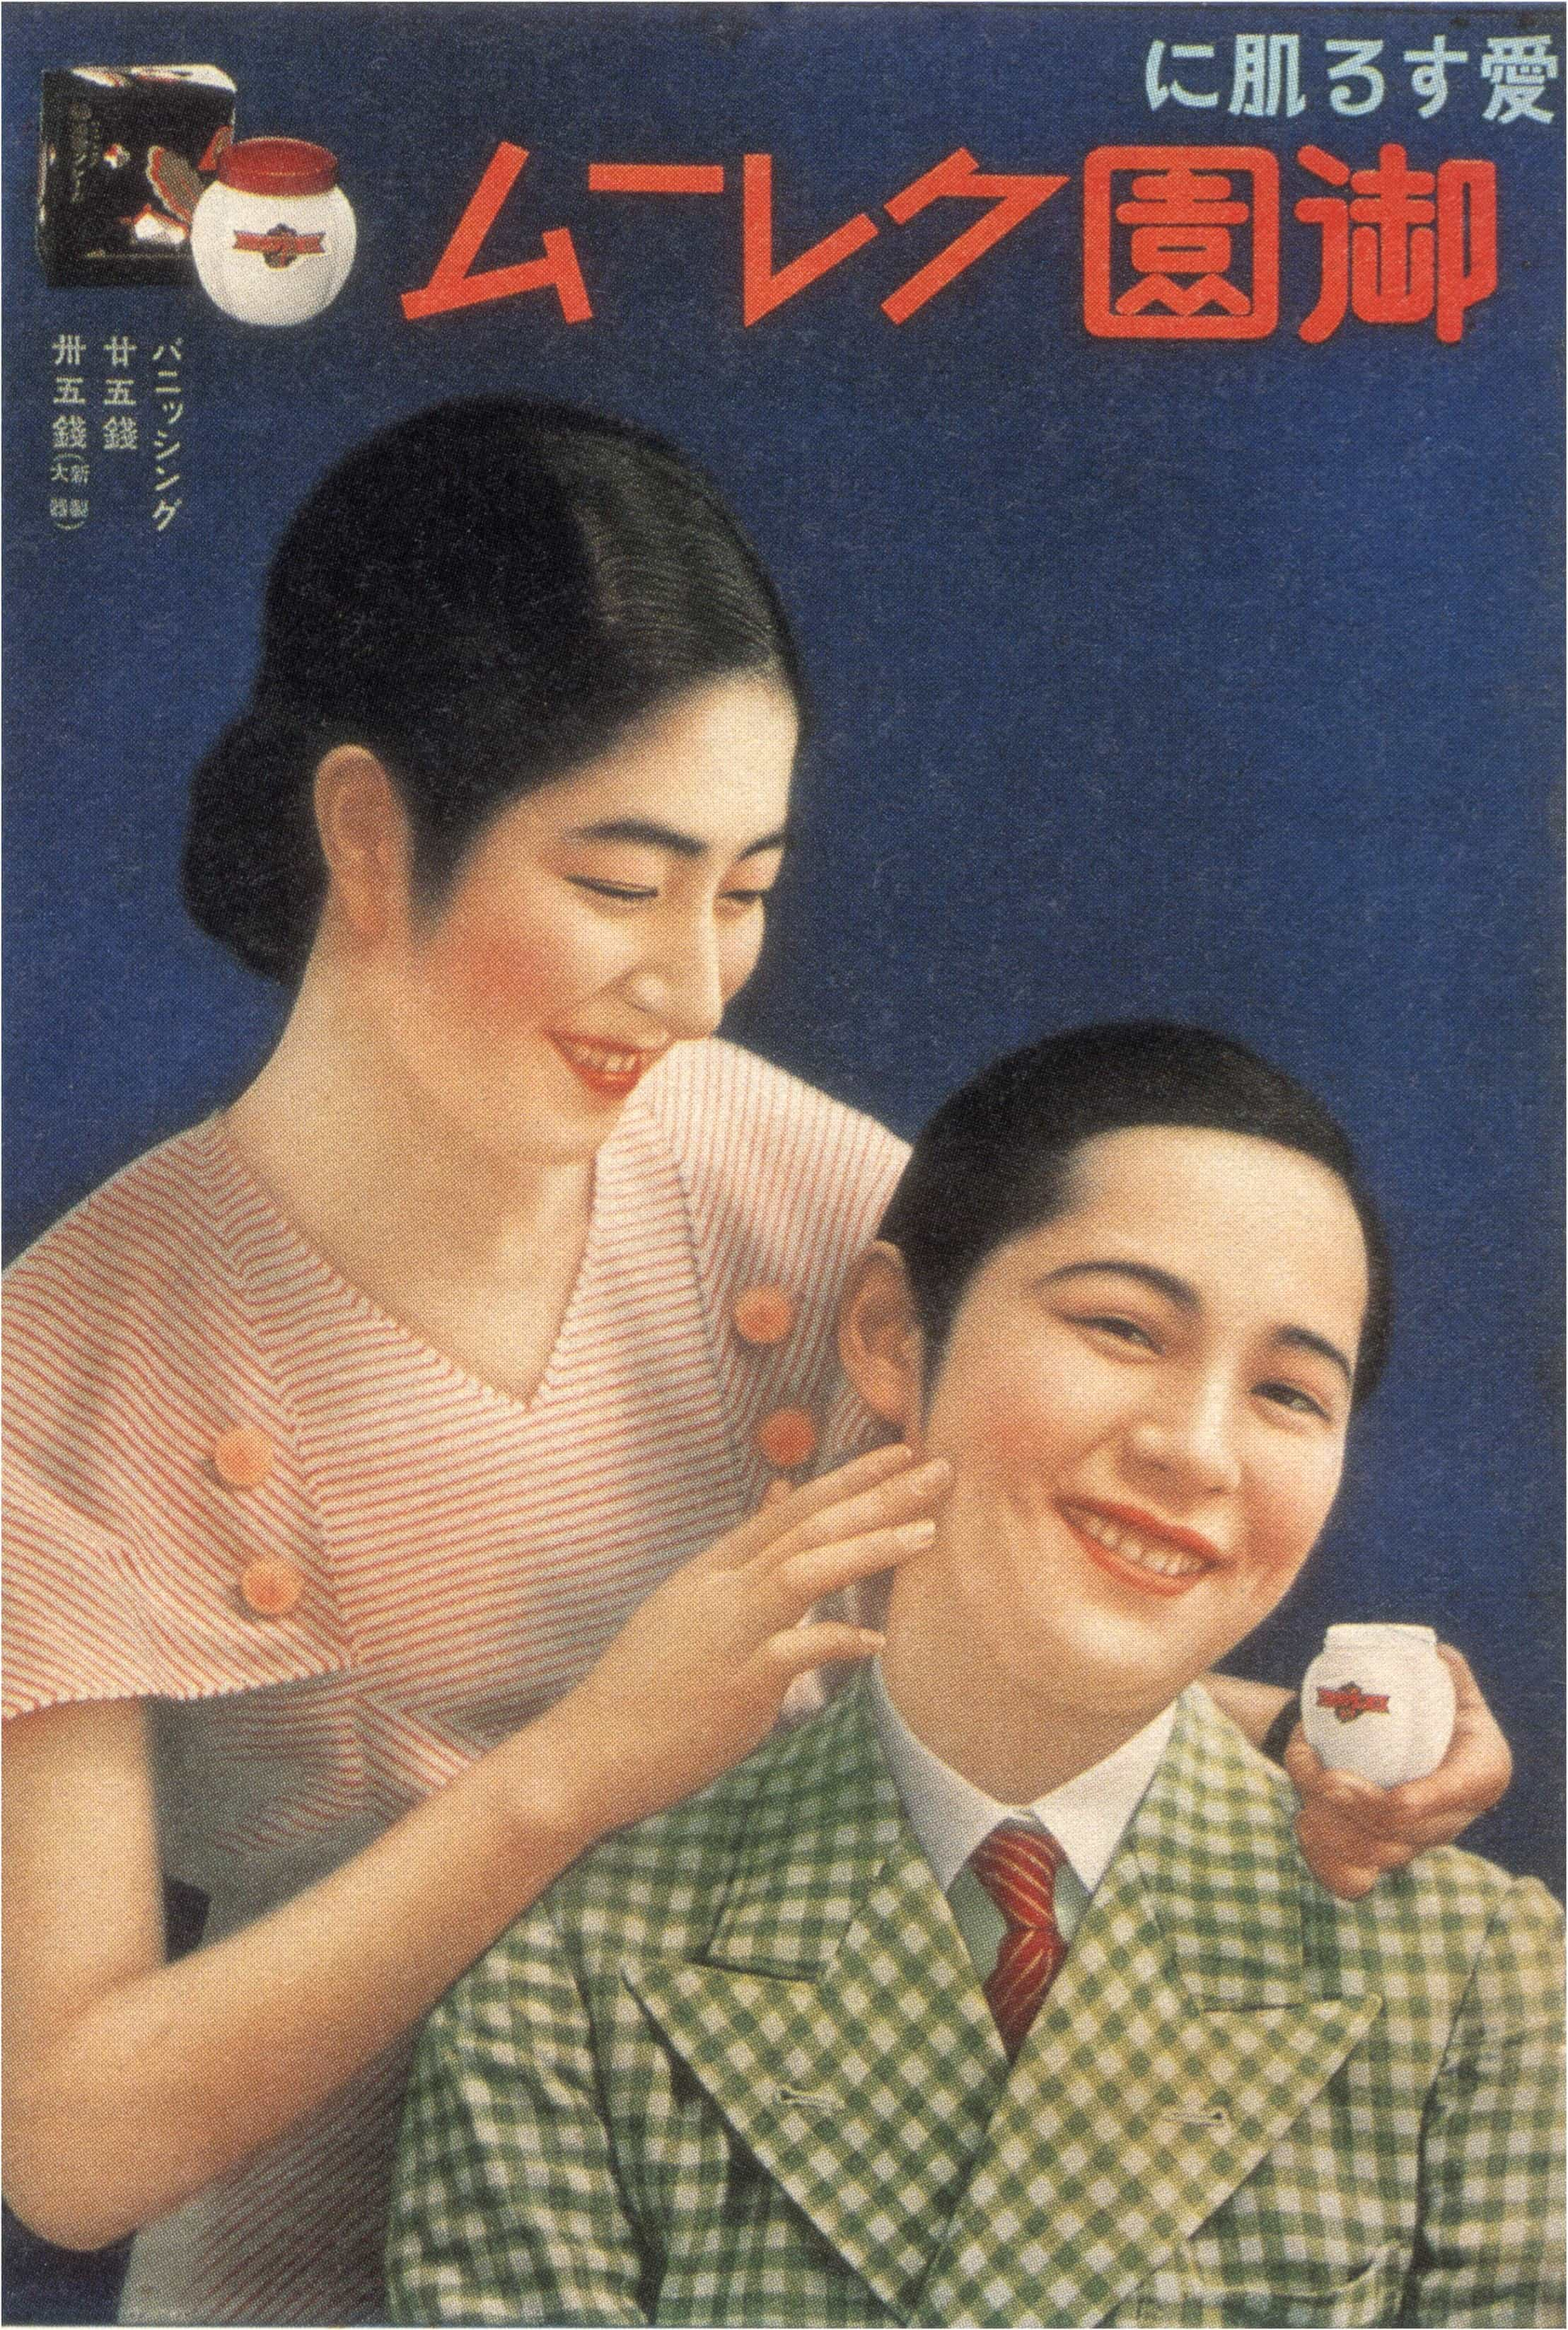 Vintage Japanese Advertising Posters - RetroGraphik